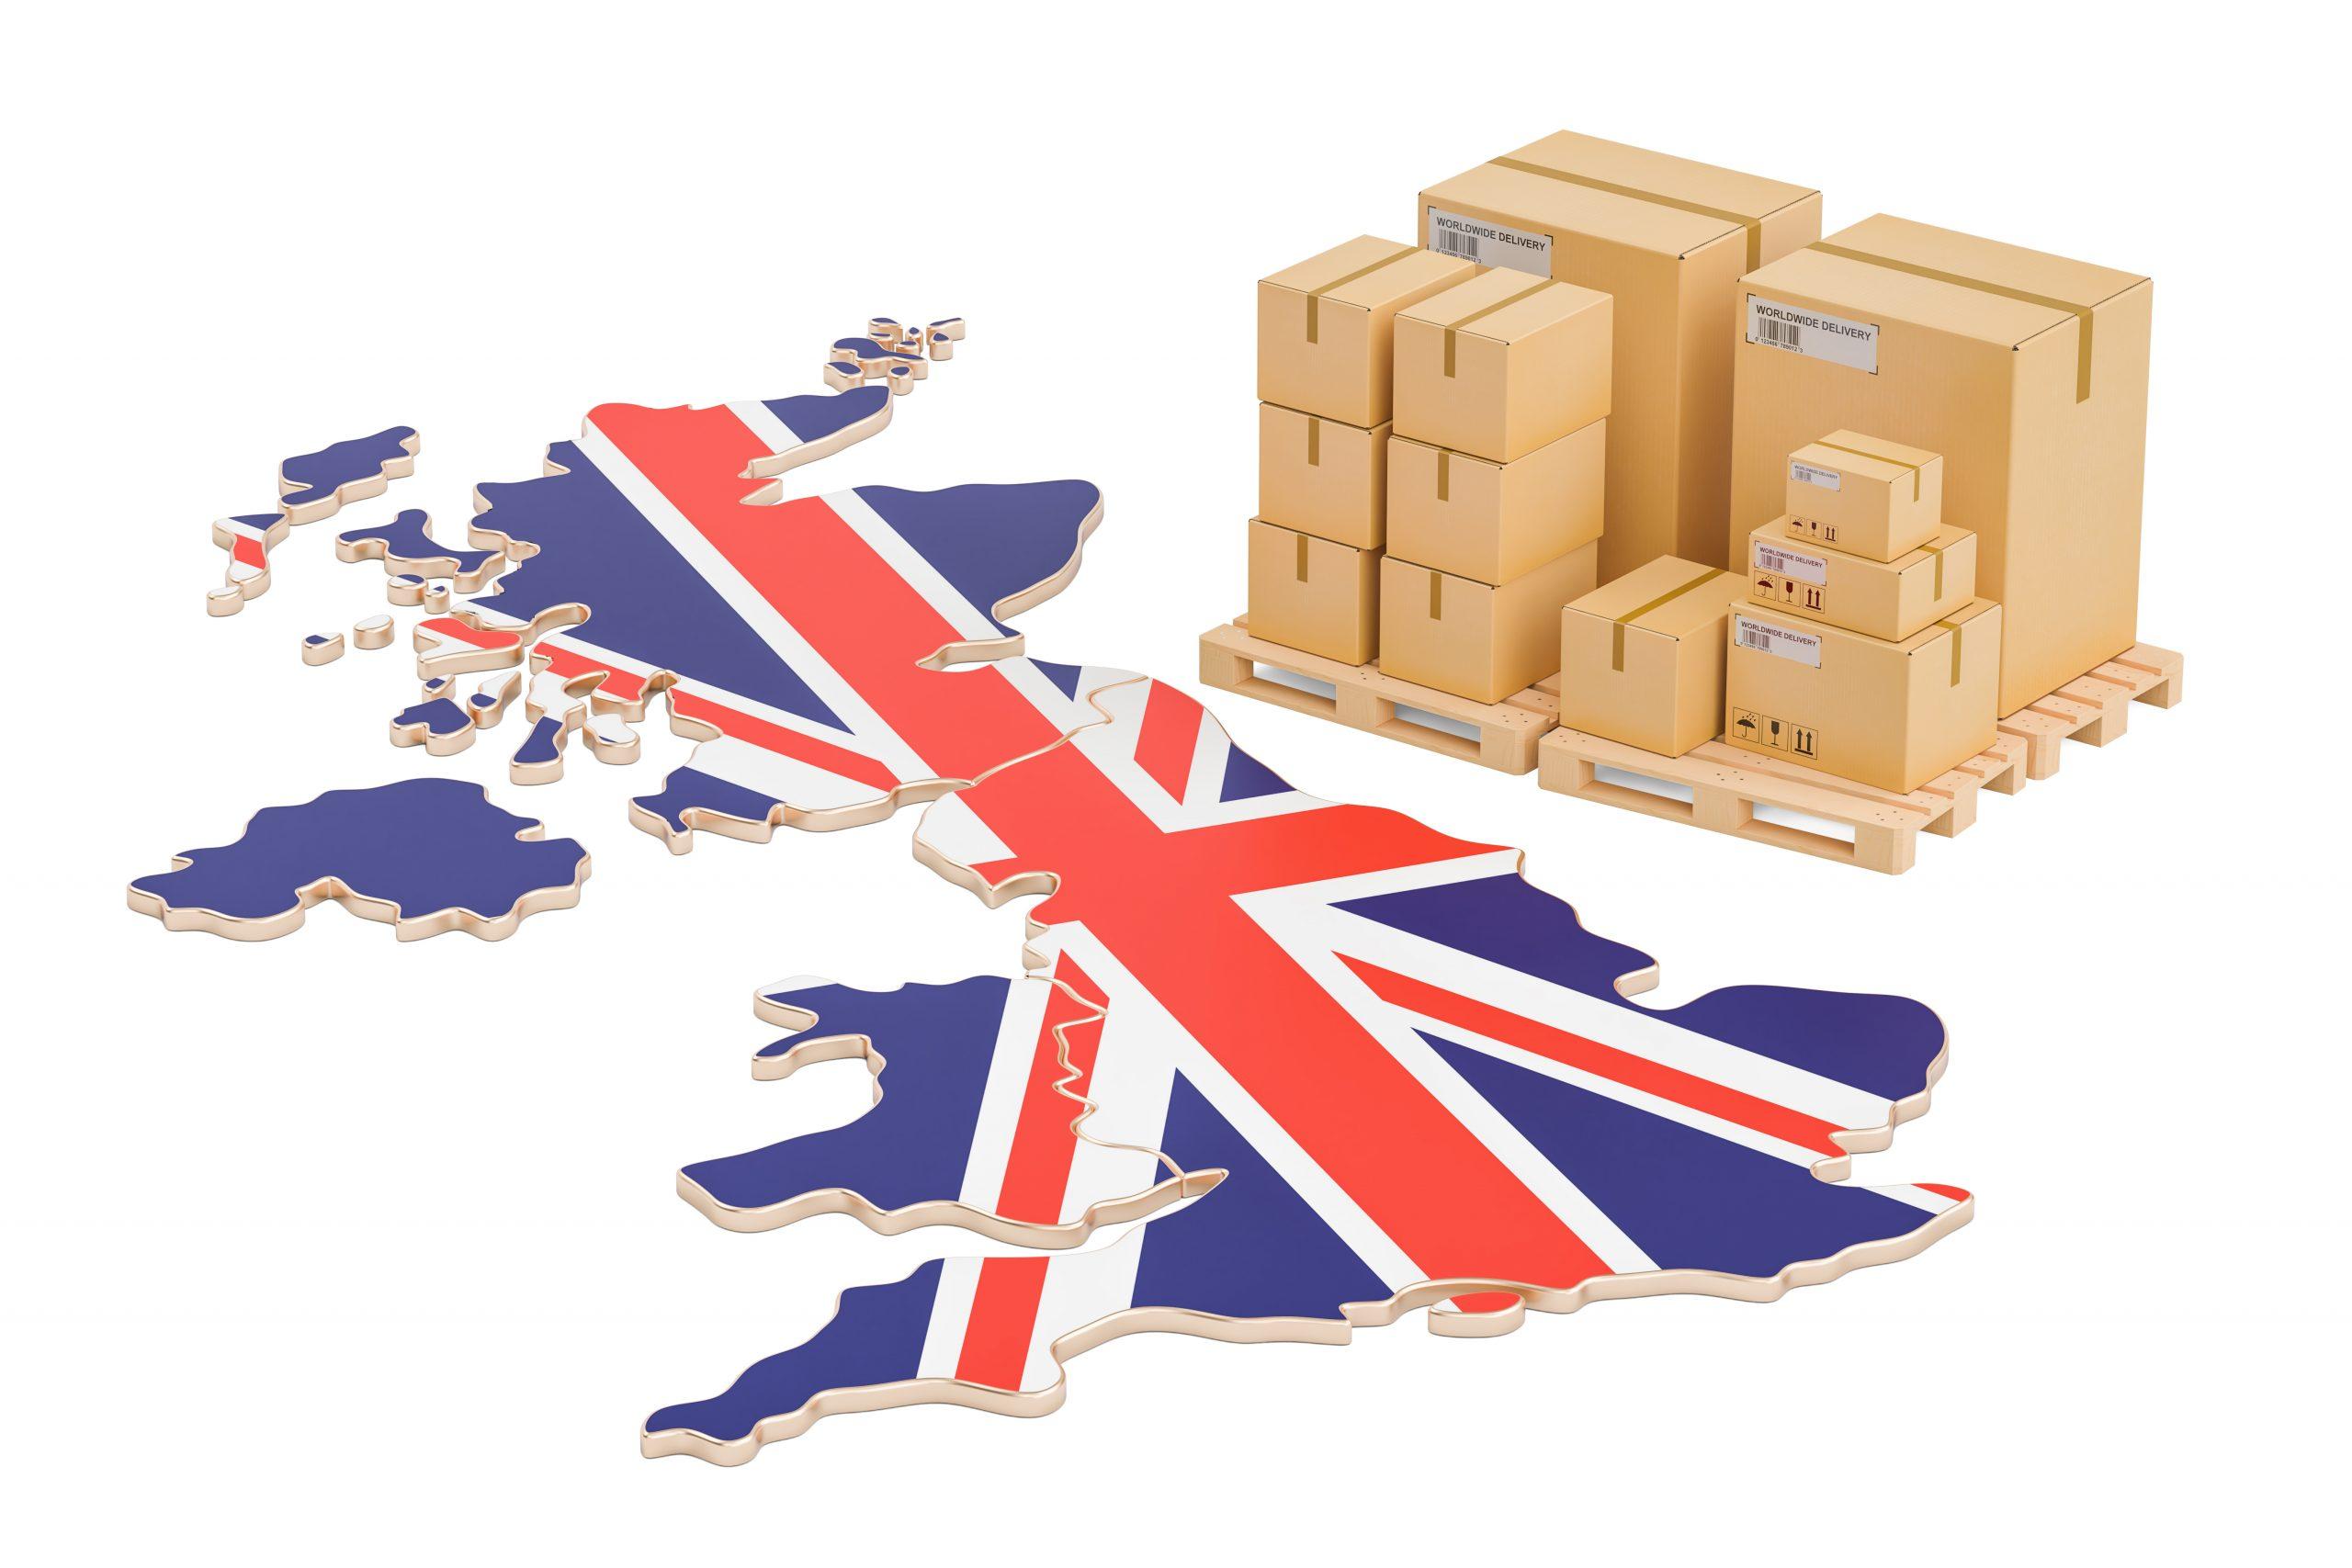 Where Do Compass Courier Services Deliver?